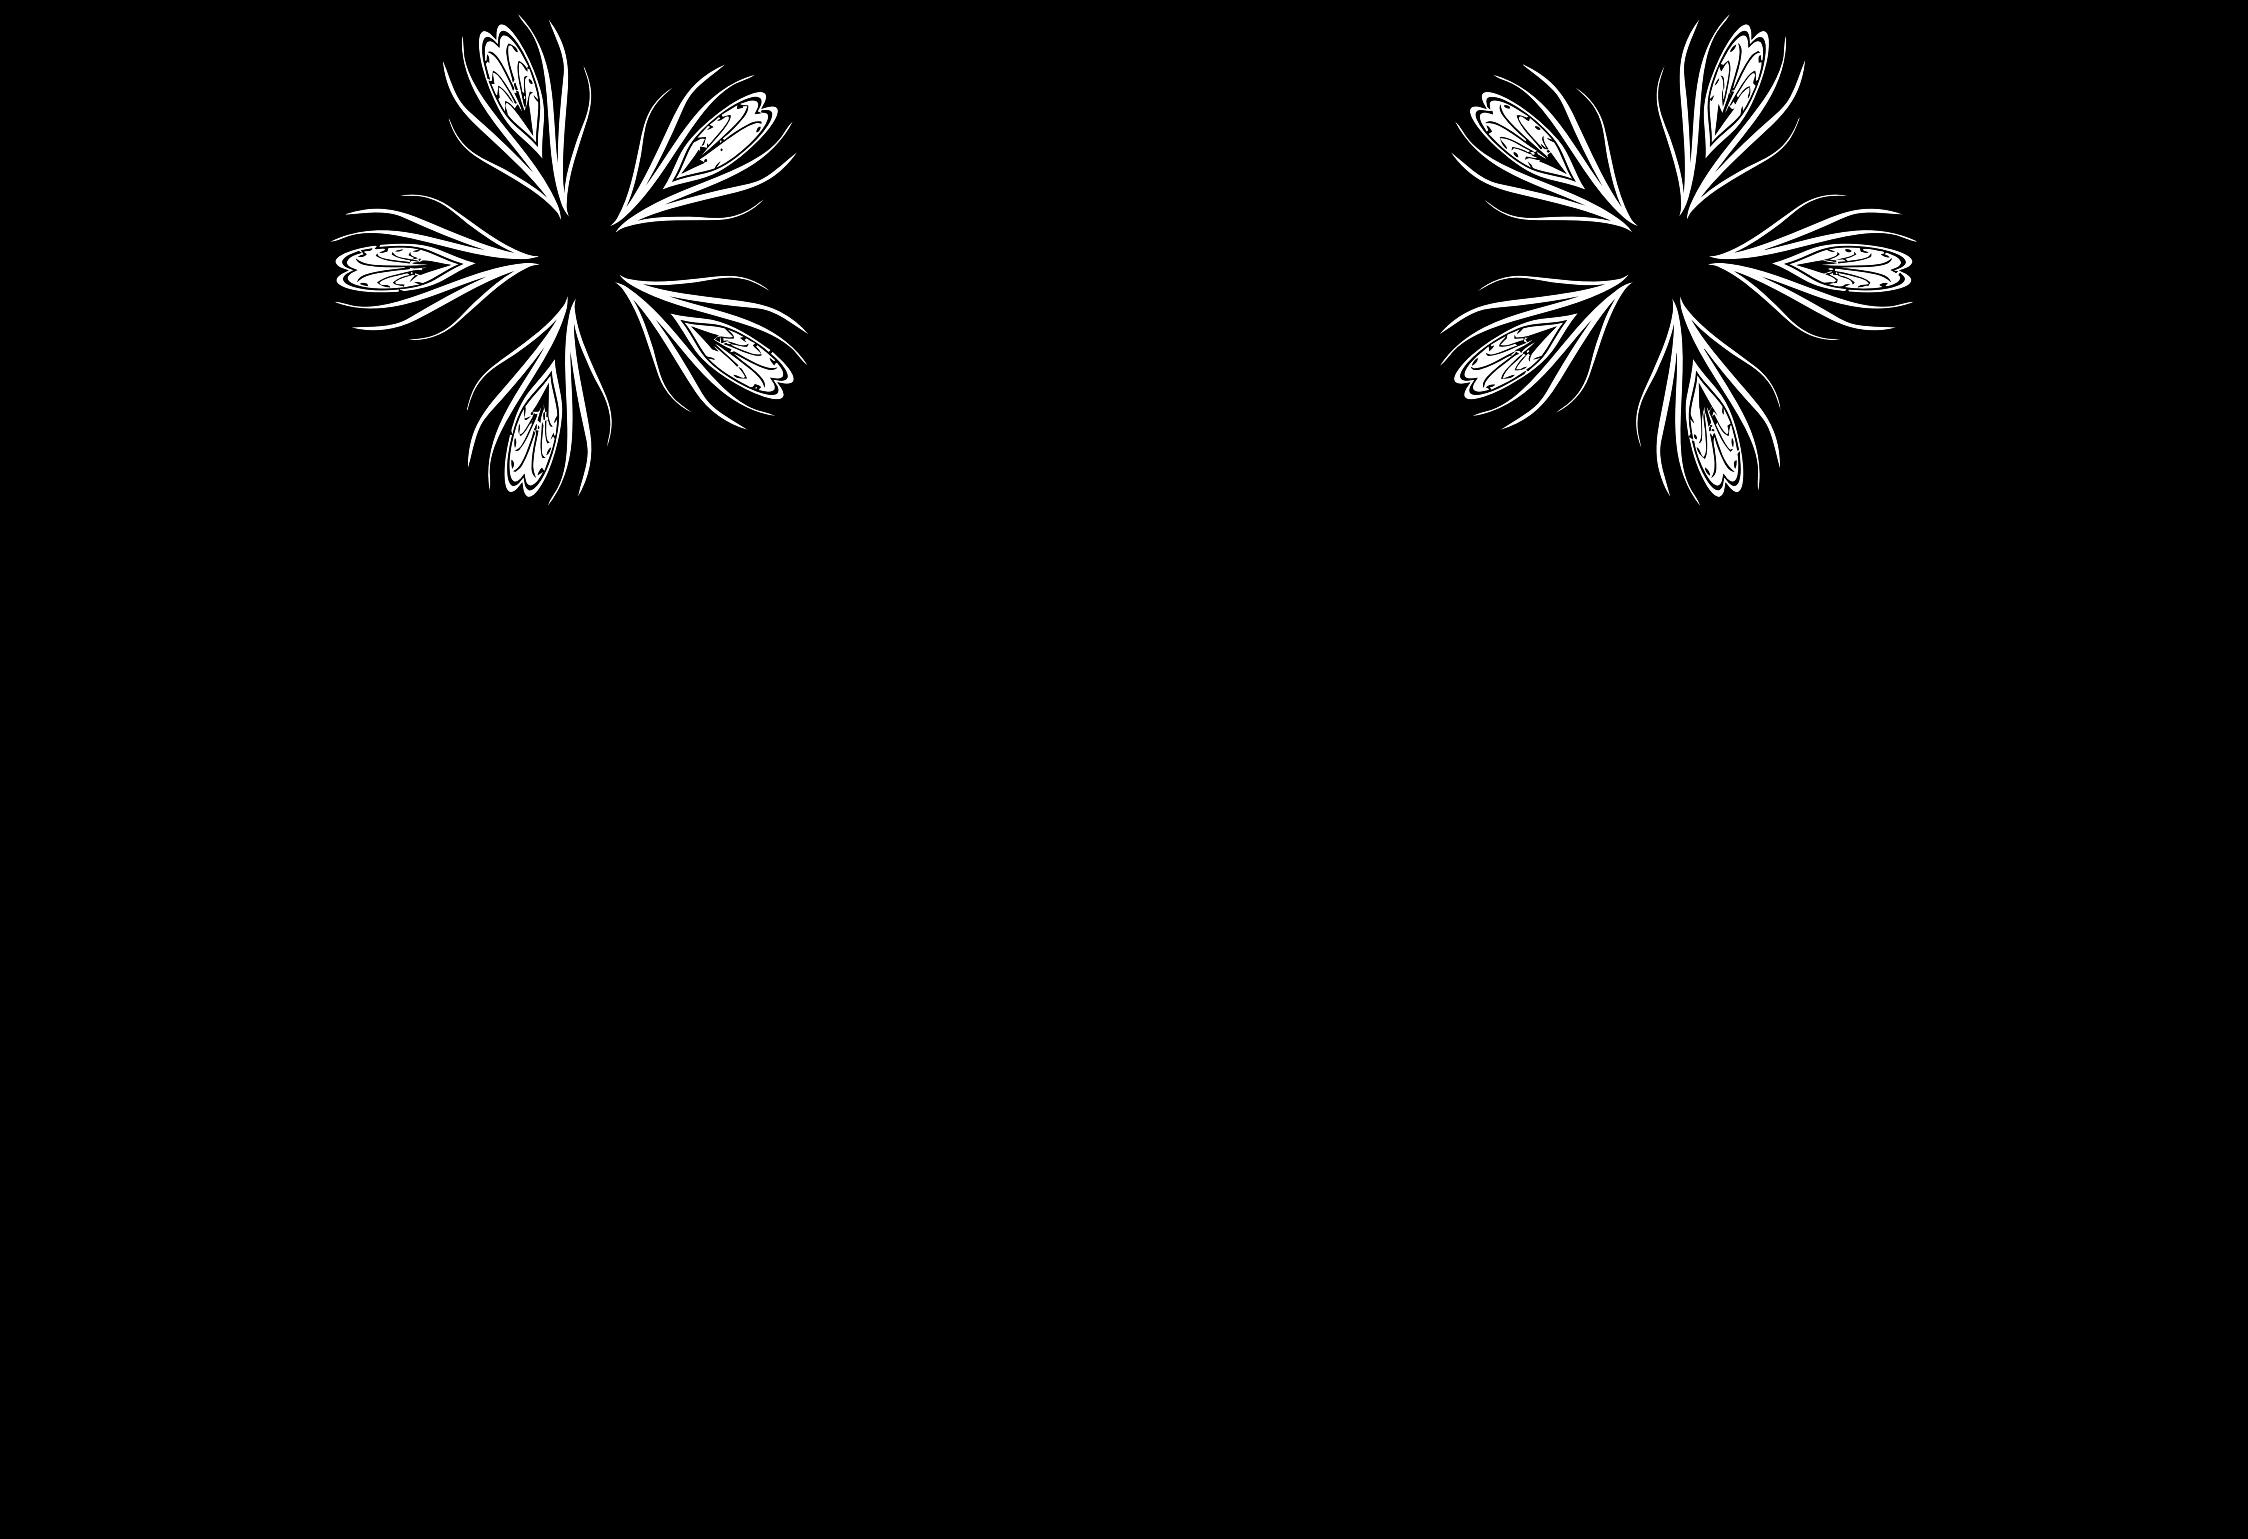 Transparent horseshoe clip art - Silhouette Flower Designs At - Line Art Flower Designs